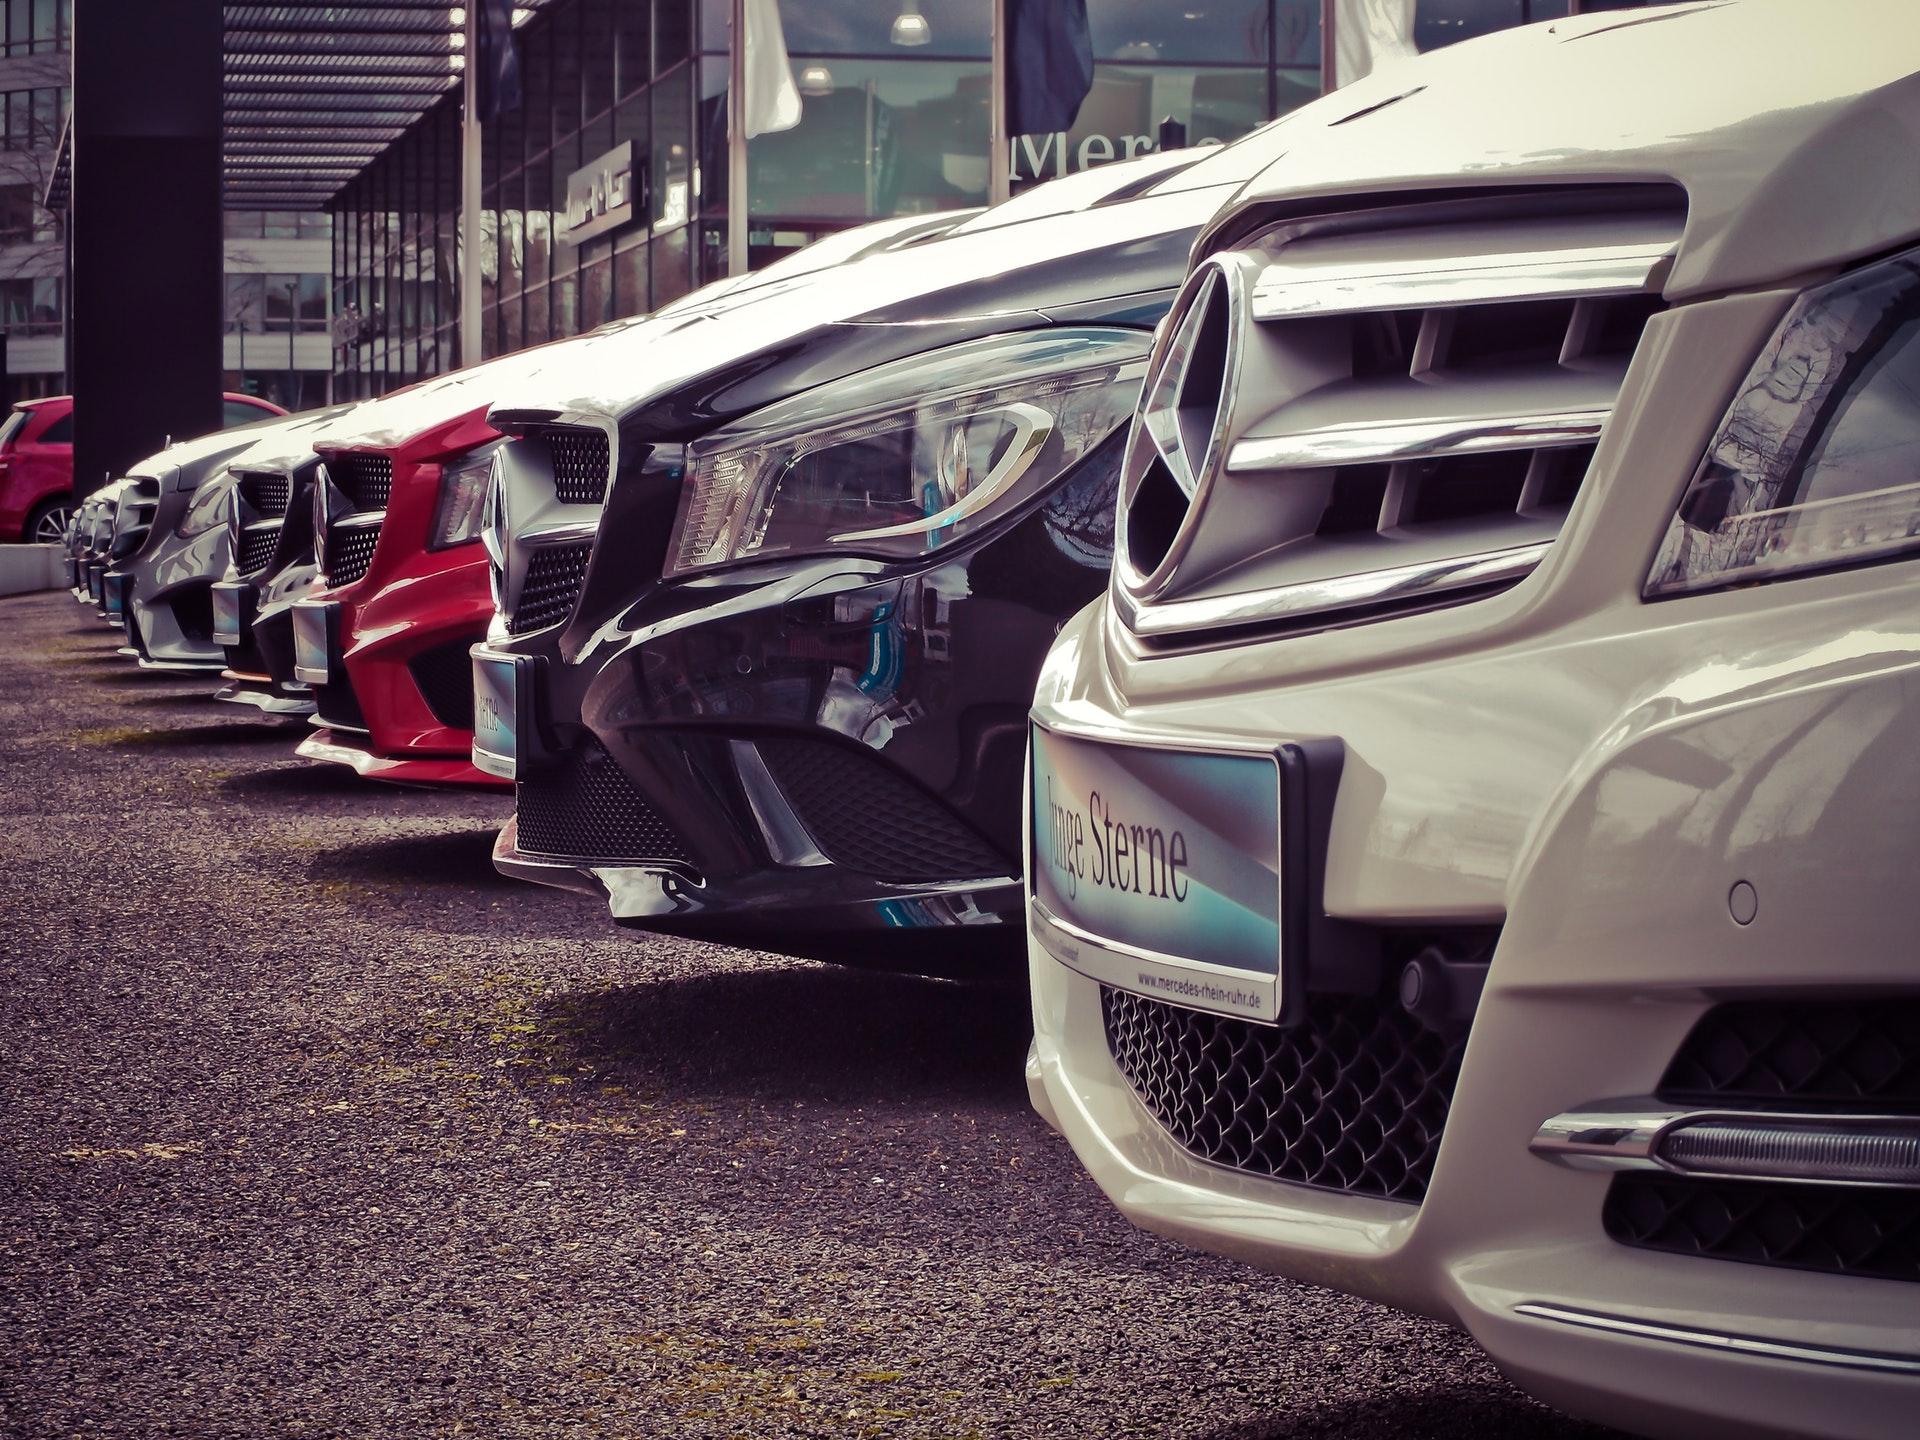 Line of new mercedes benz cars at car dealership